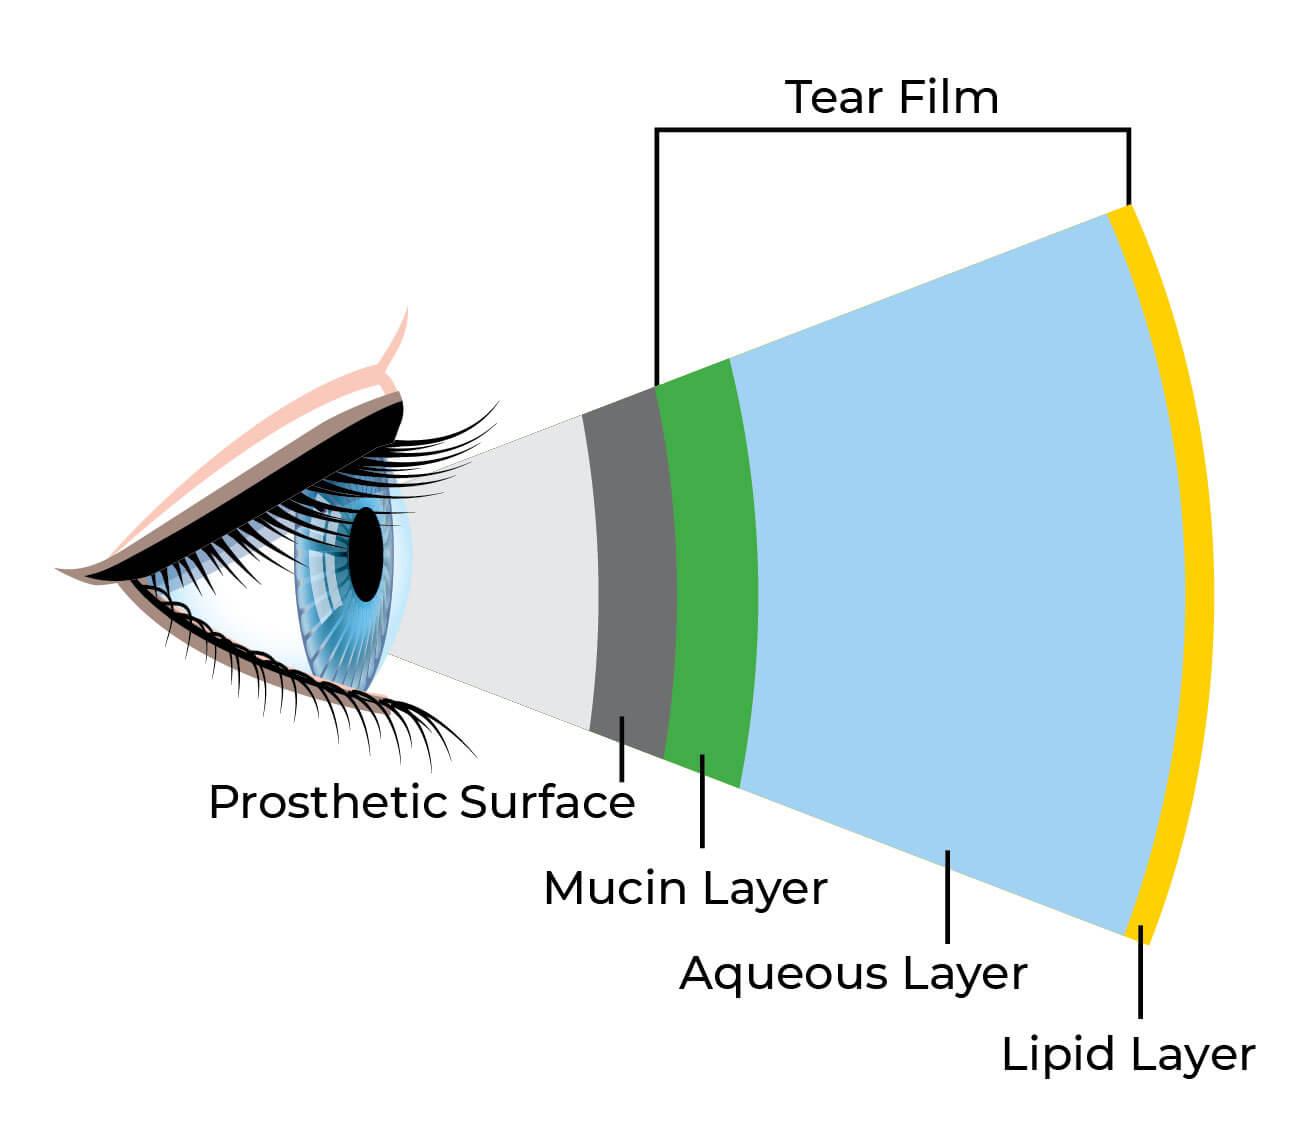 Artificial Eye Lubricants shown in diagrams